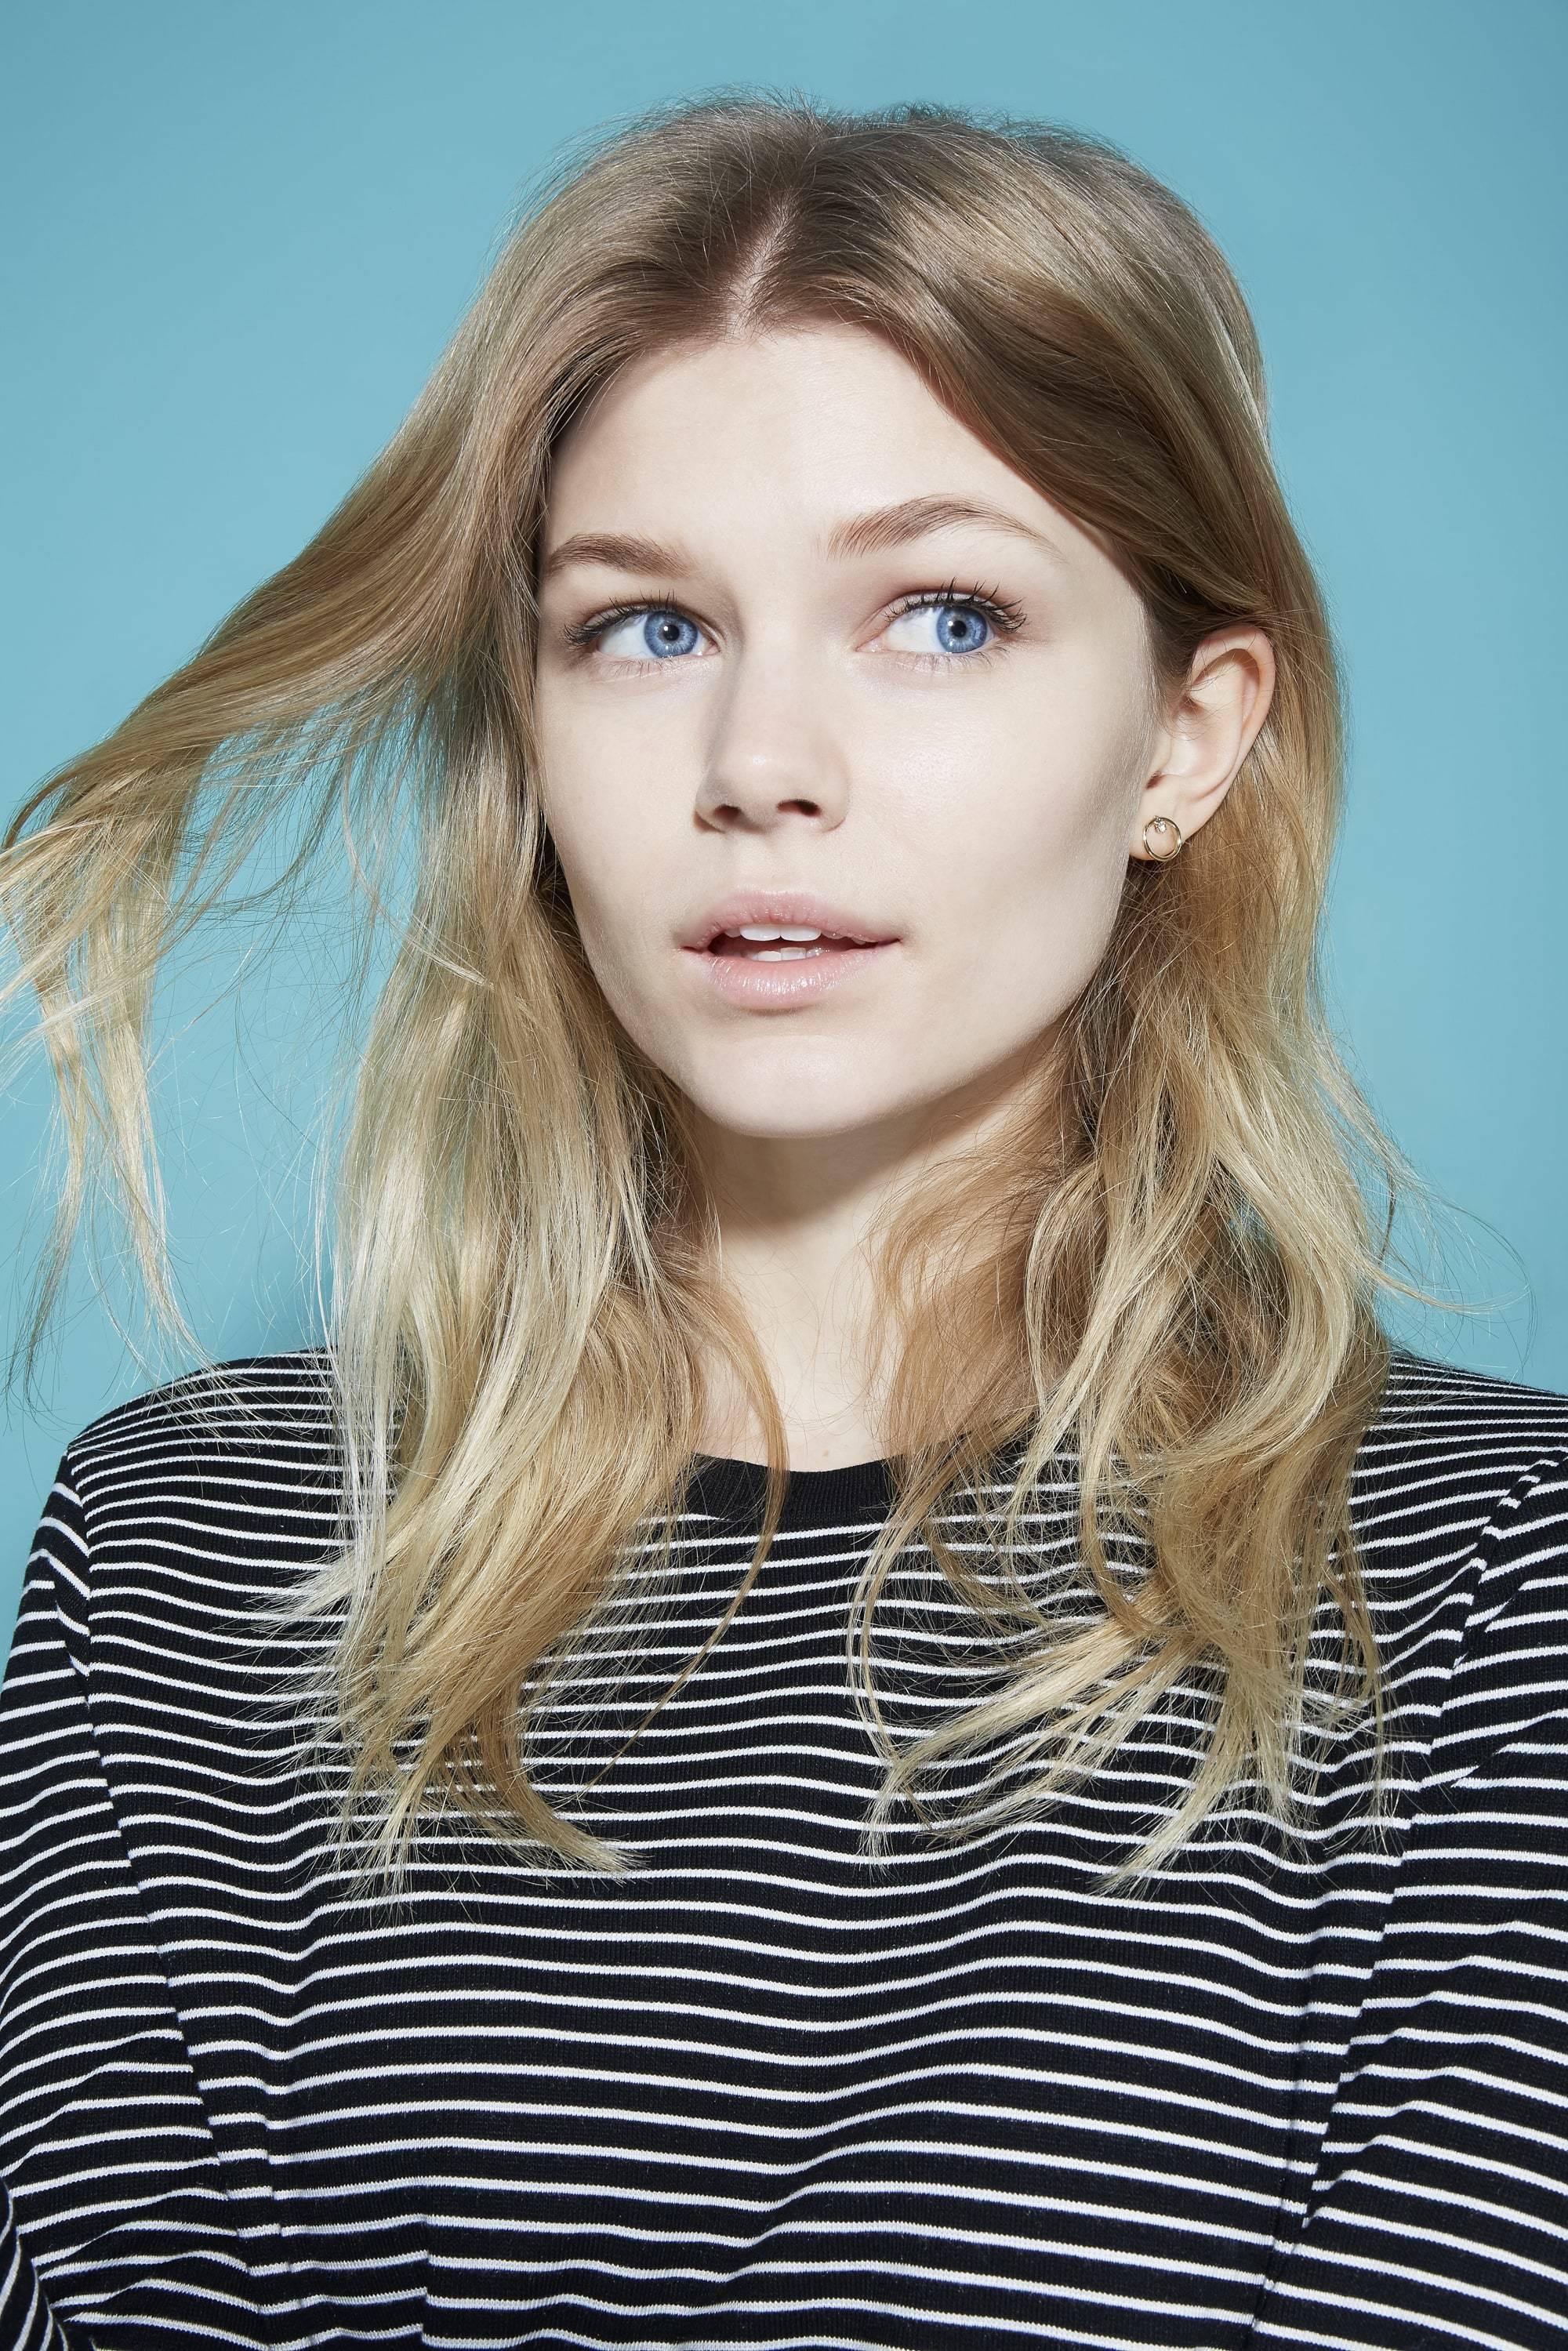 Blonde woman holding hair split ends